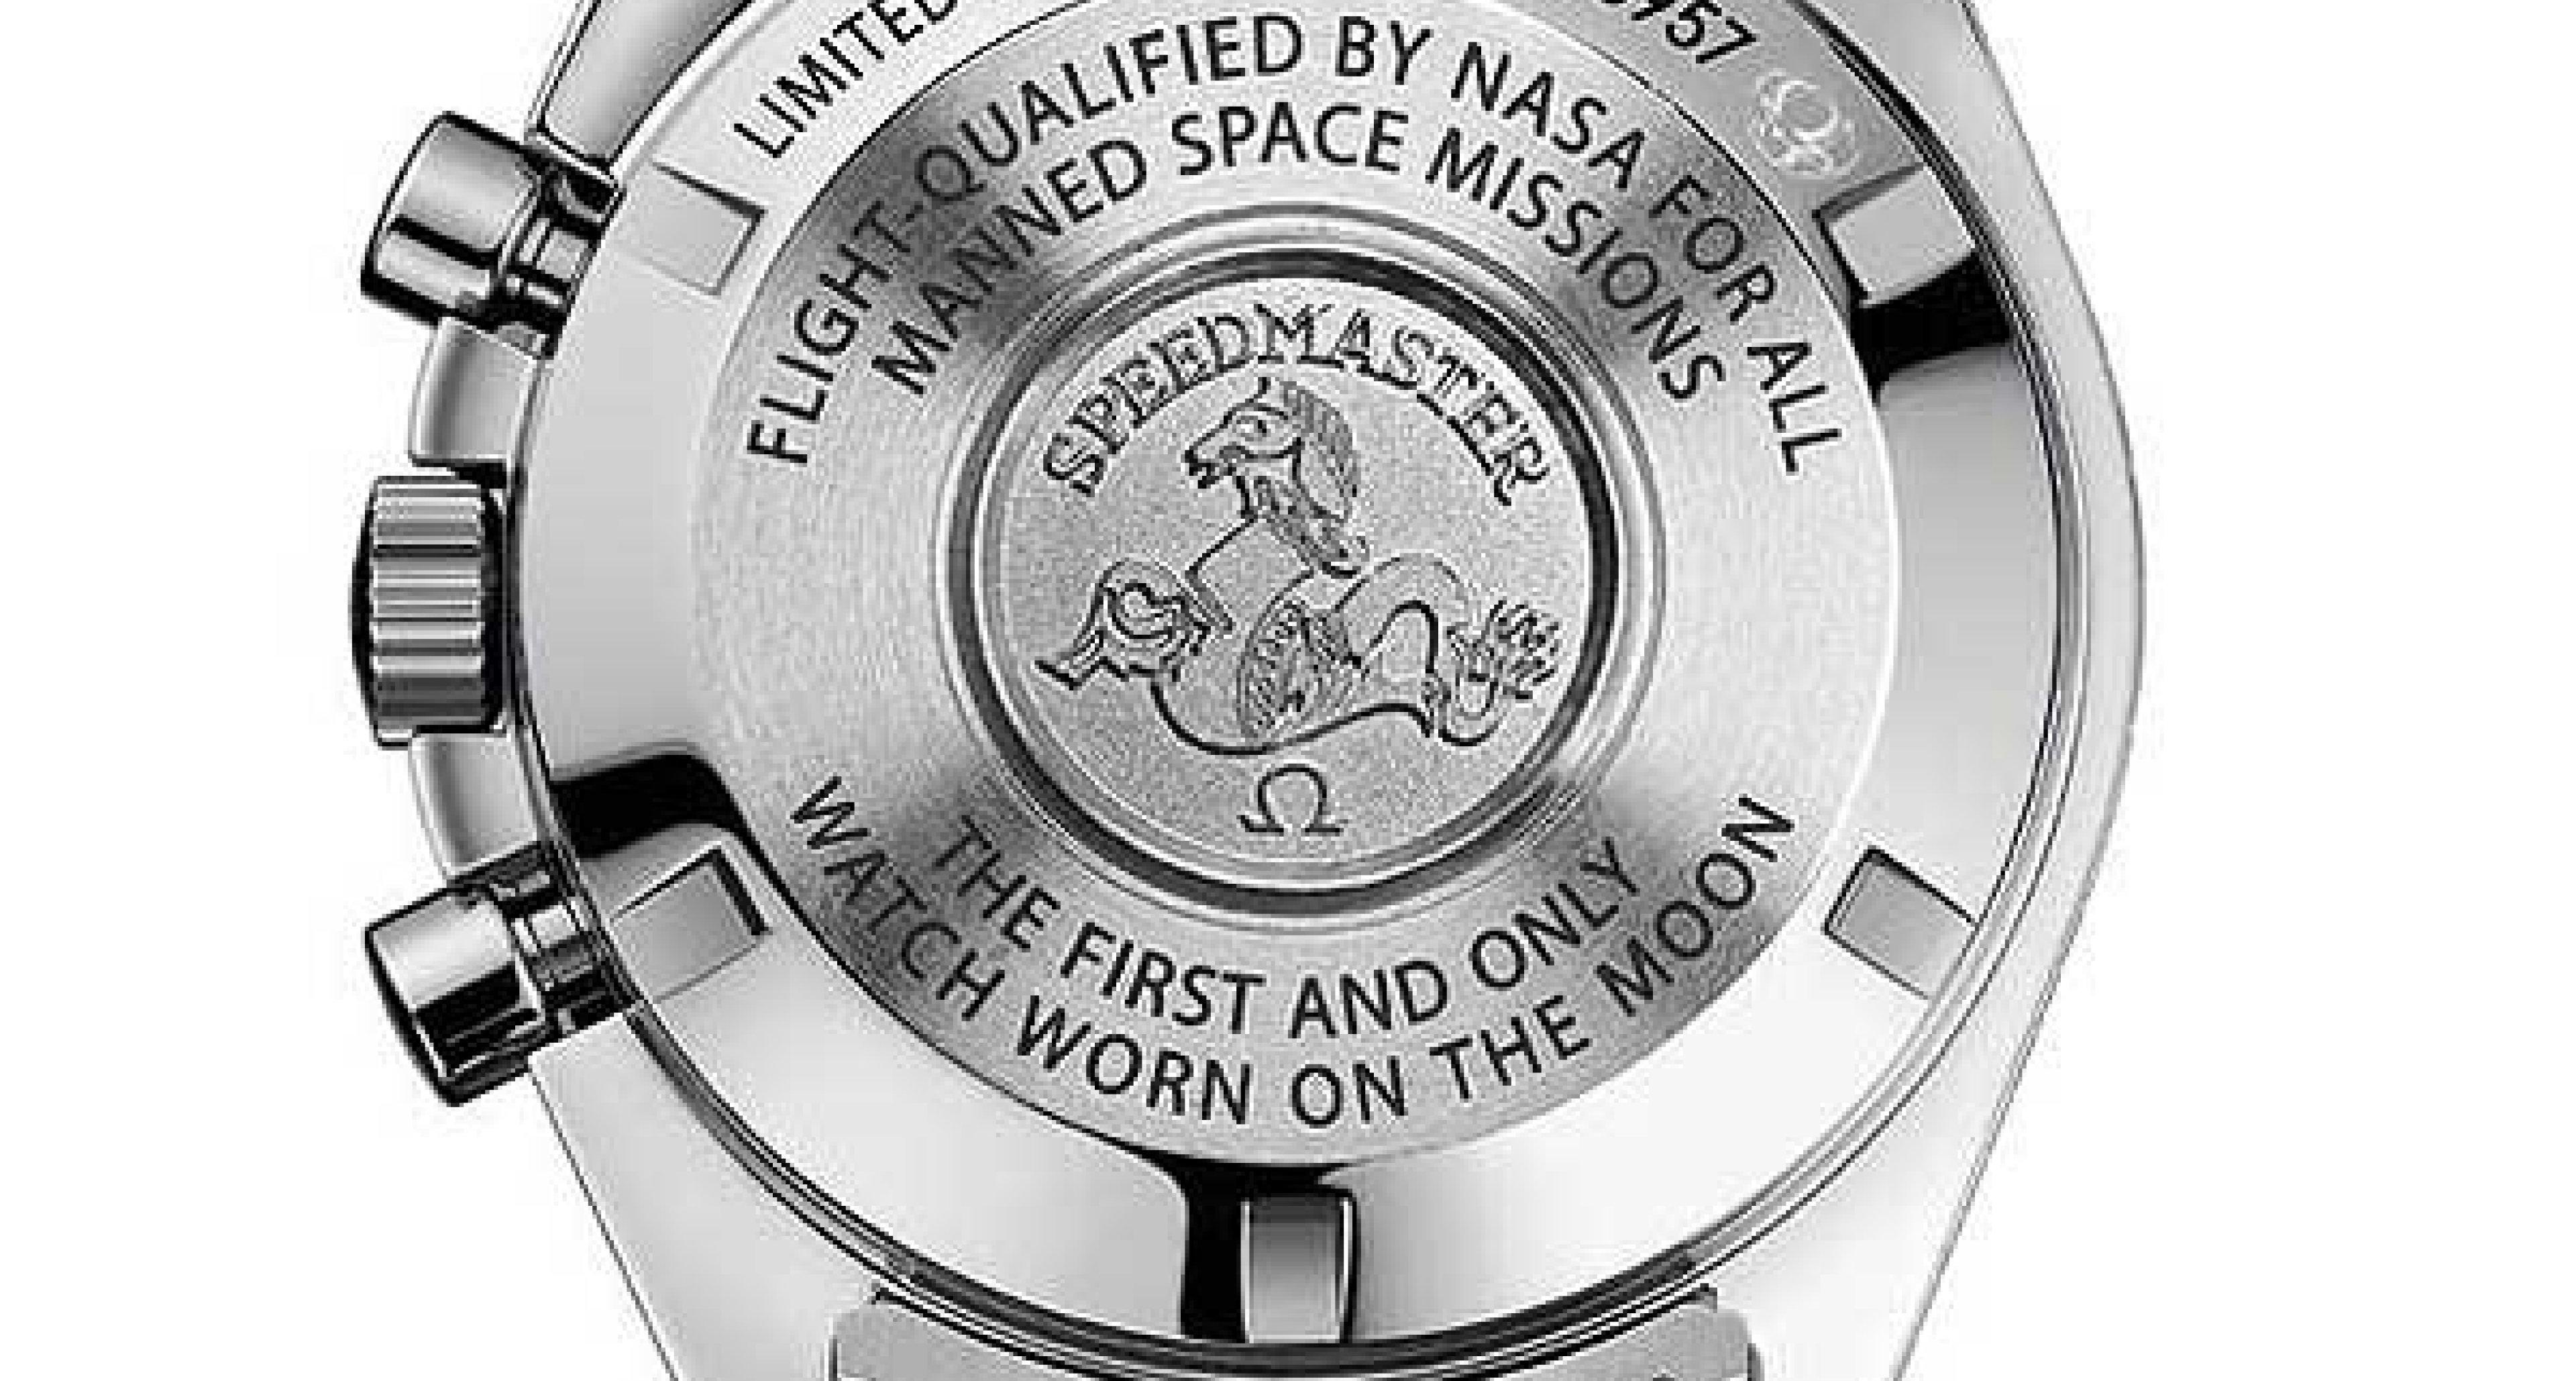 Omega Speedmaster Professional: 50th Anniversary Models